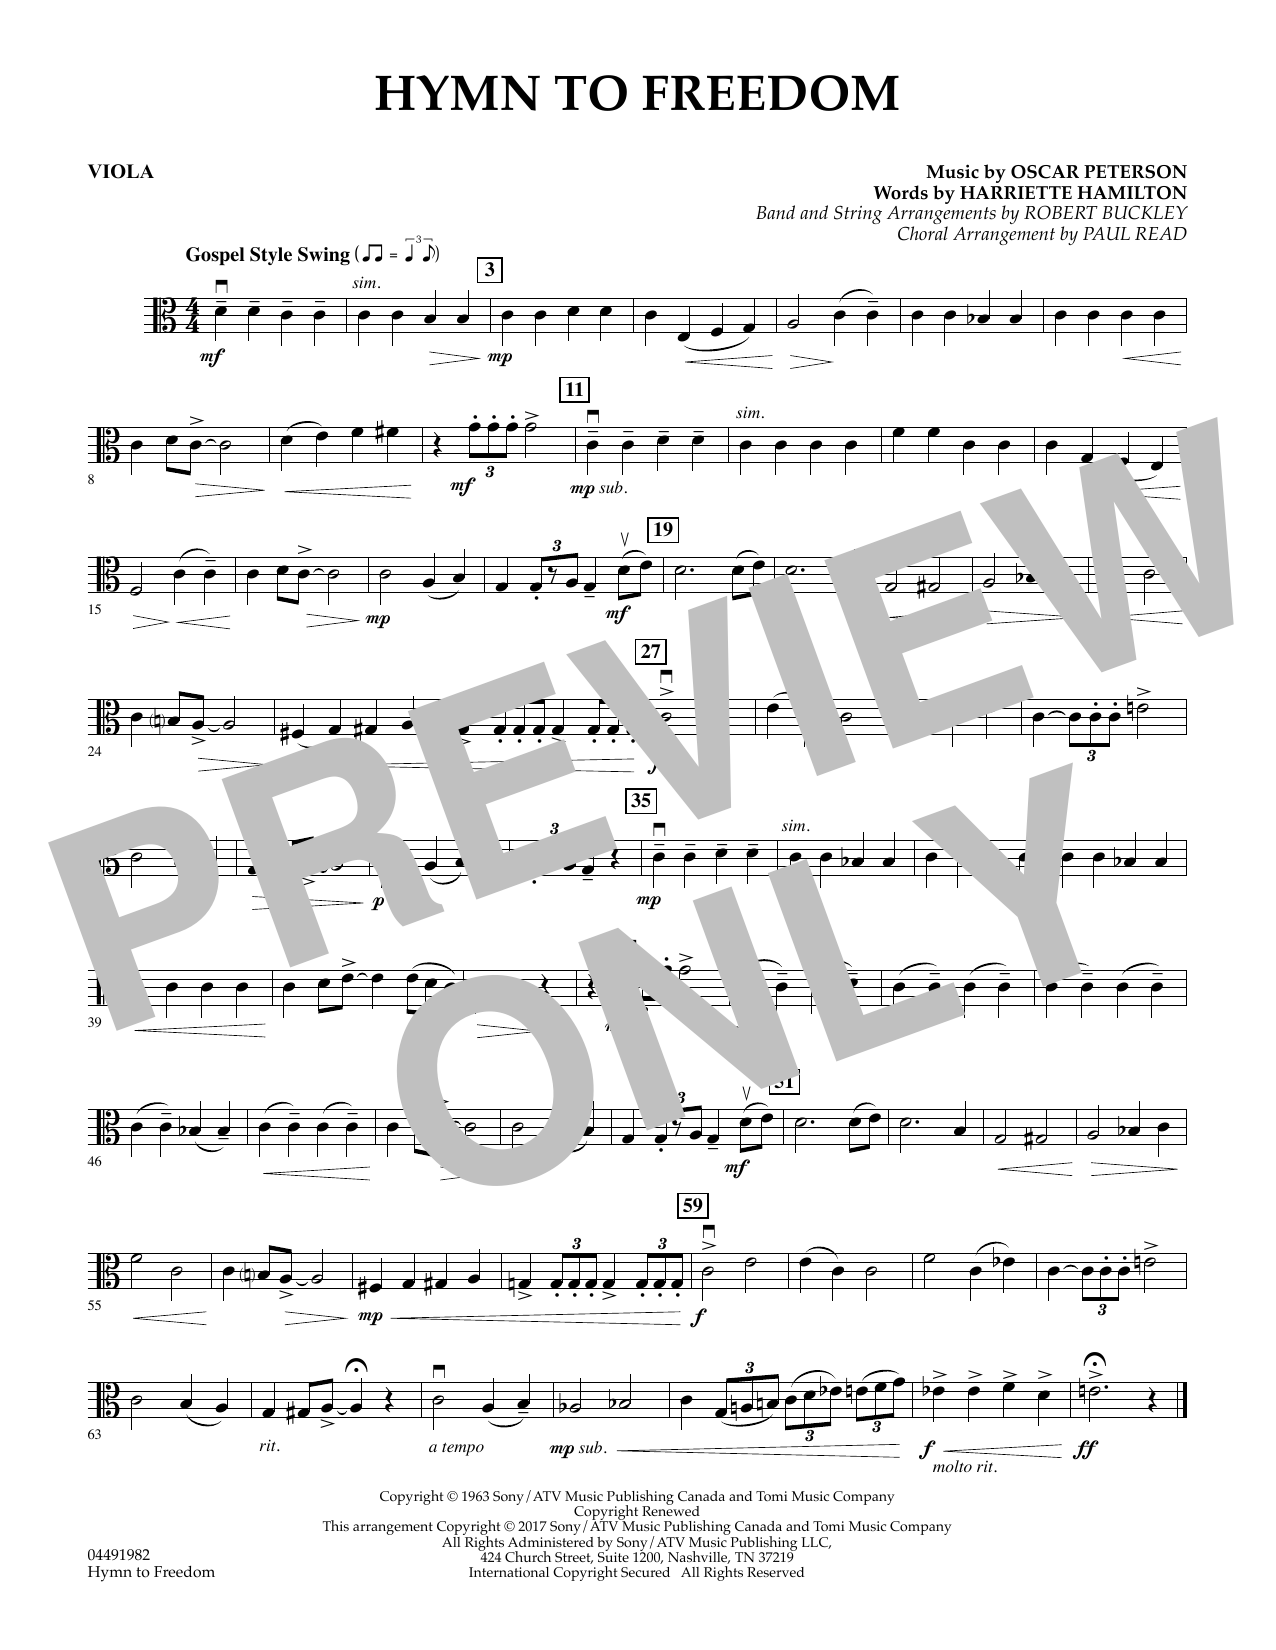 Paul Read - Hymn to Freedom - Viola